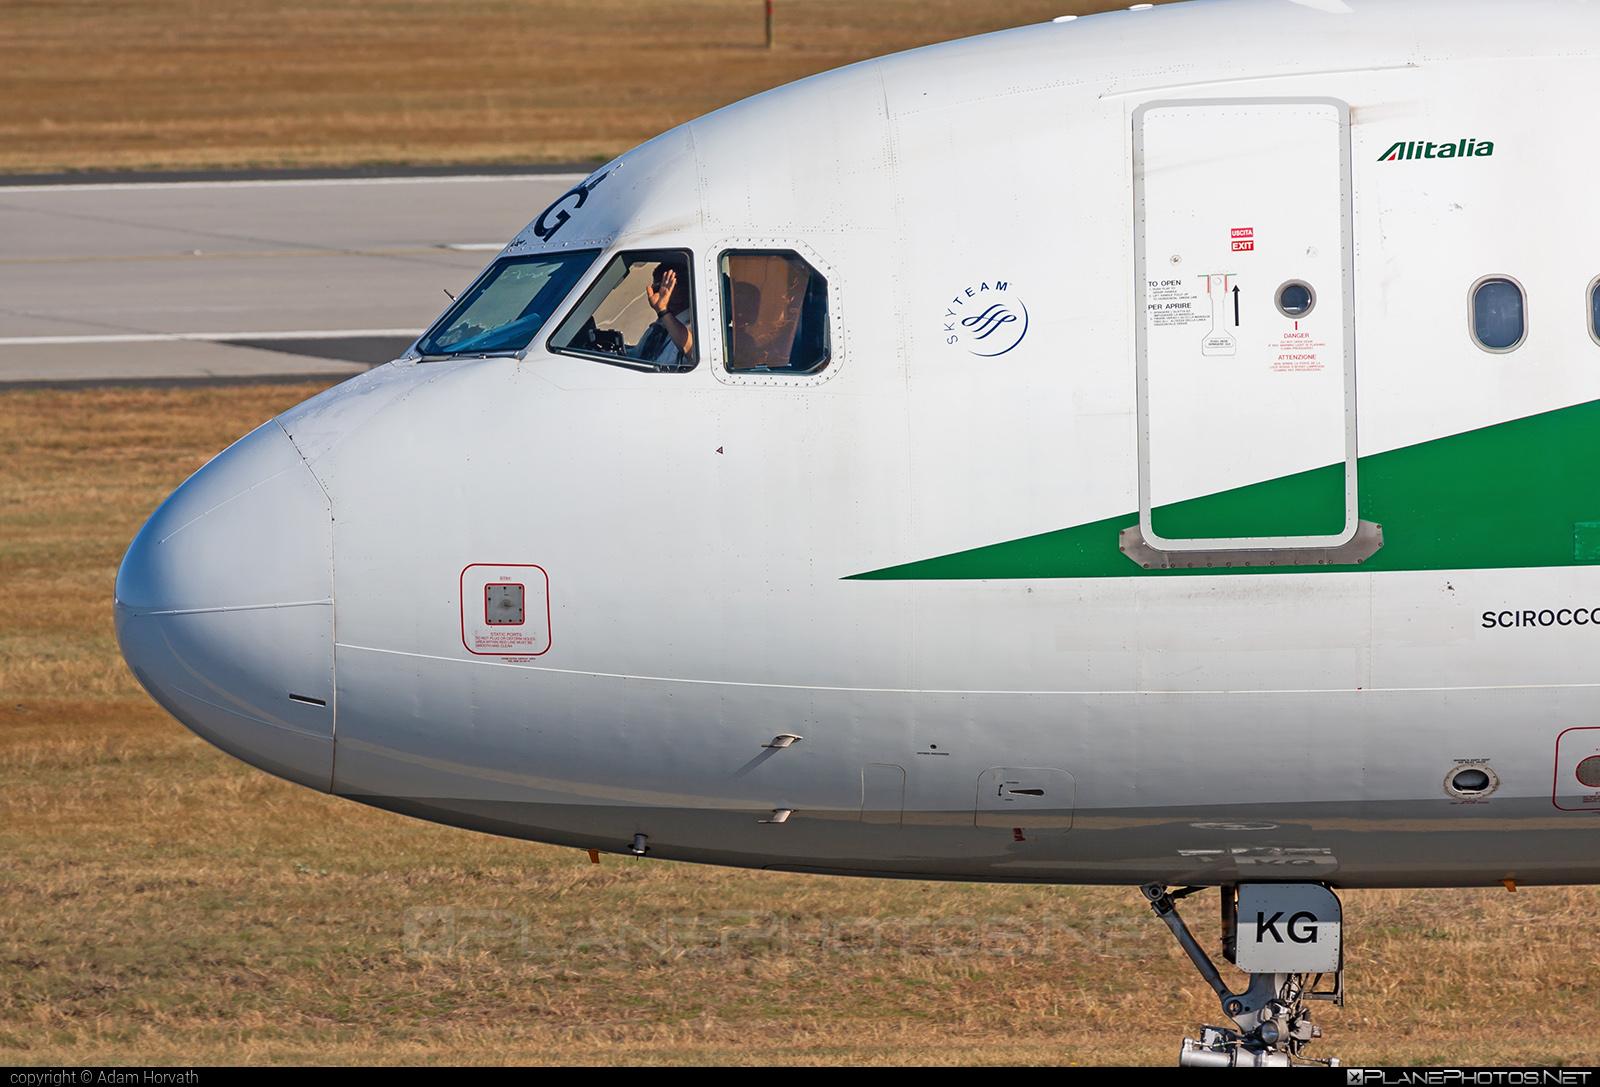 Airbus A320-214 - EI-IKG operated by Alitalia #a320 #a320family #airbus #airbus320 #alitalia